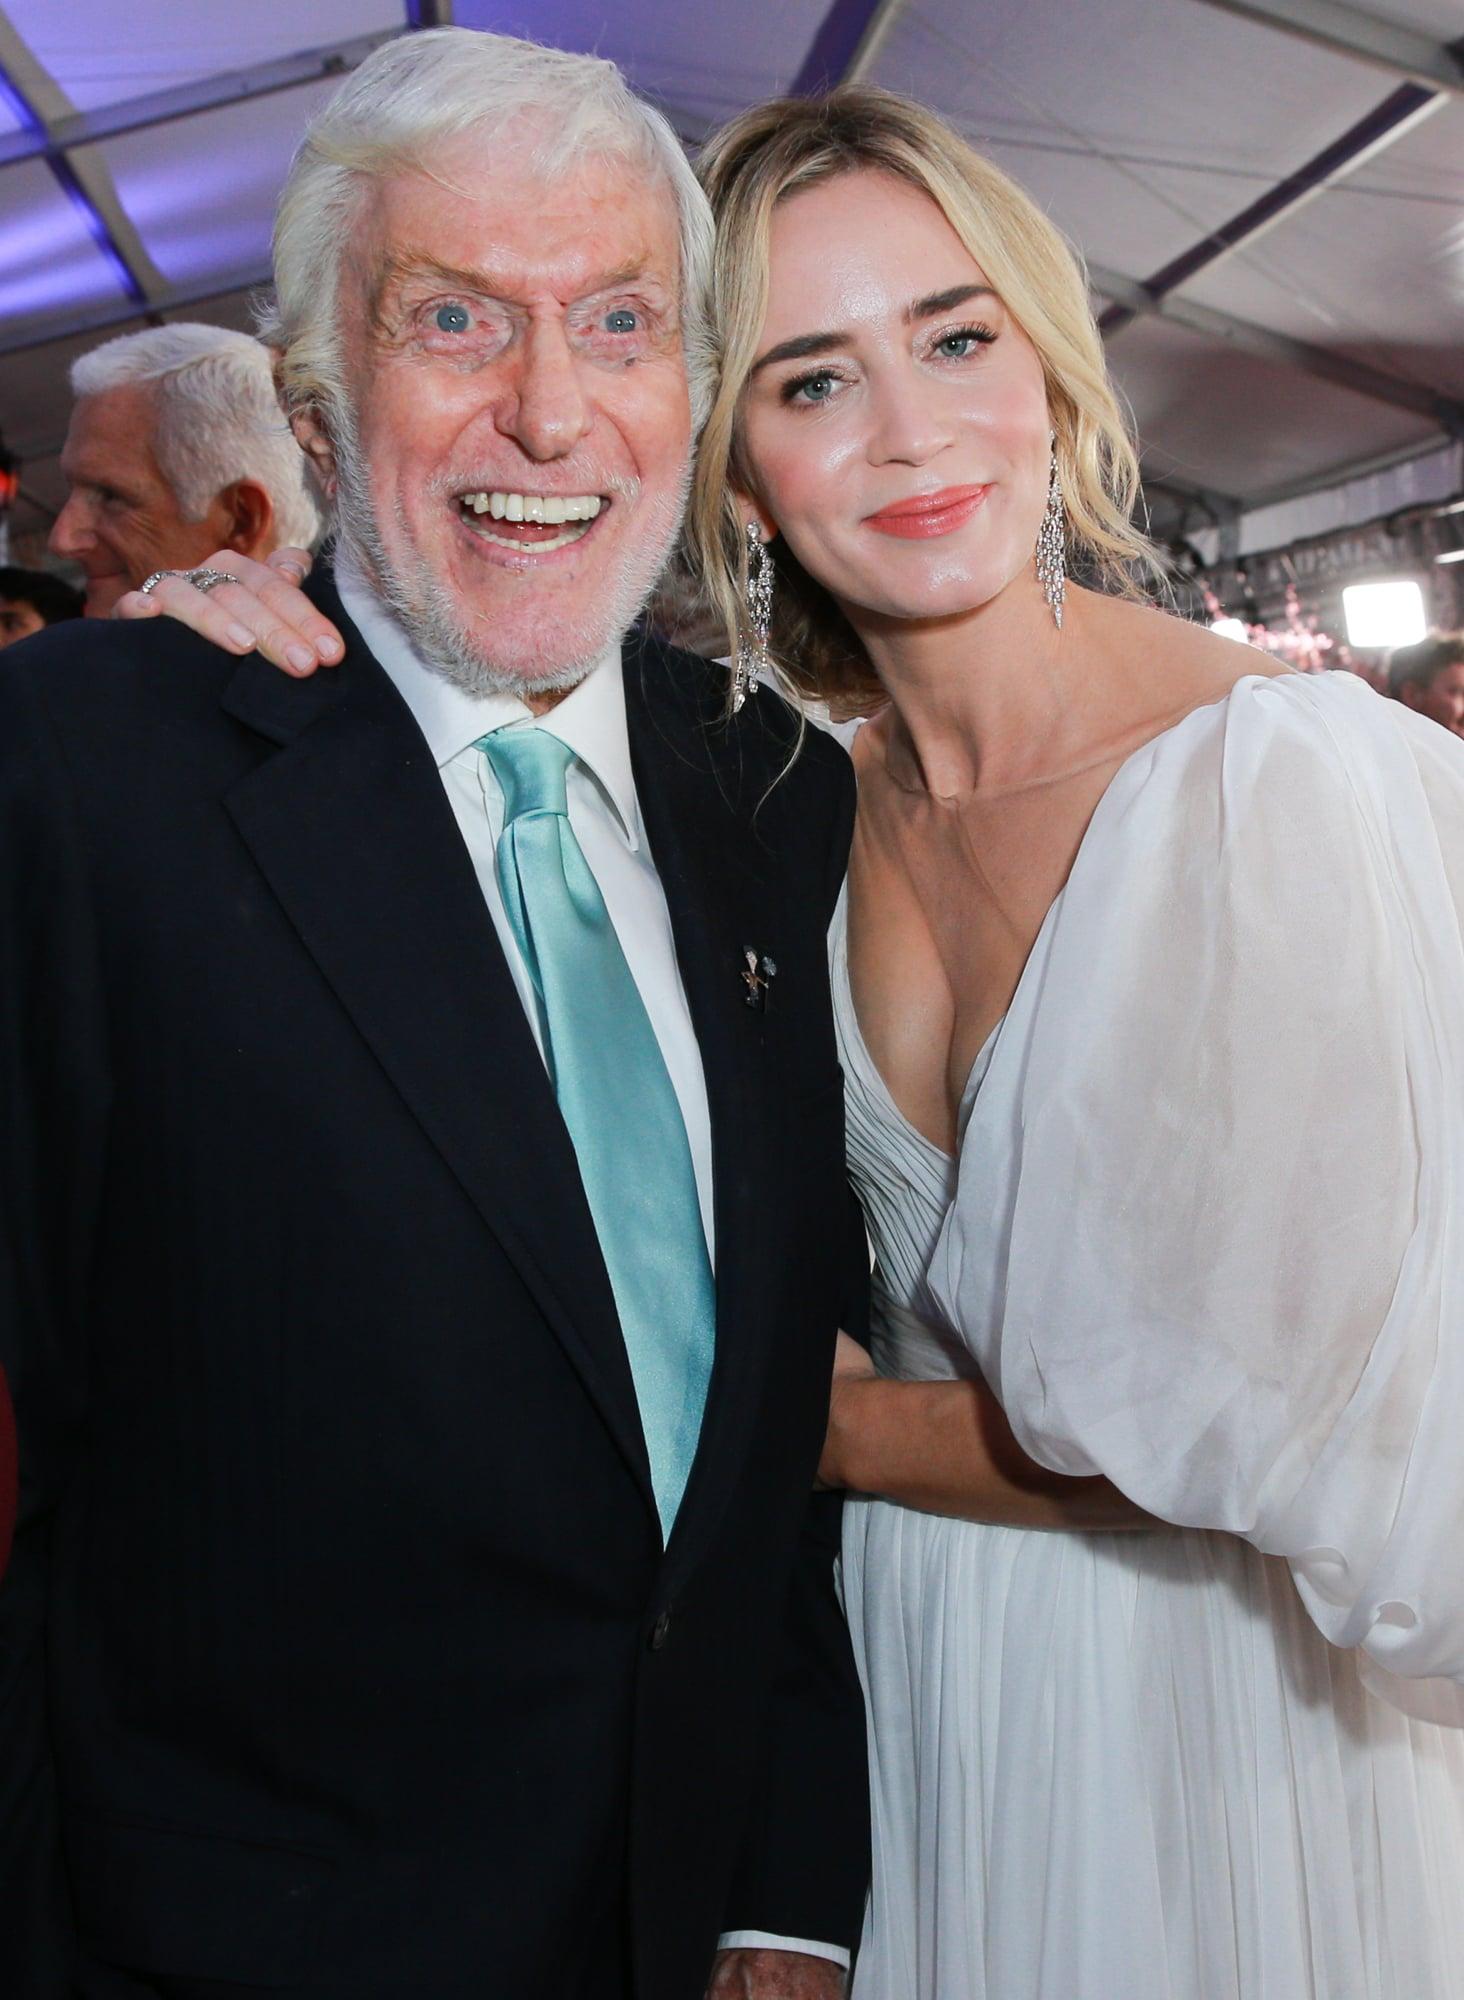 The Cast Of Mary Poppins Returns At The La Premiere 2018 Popsugar Celebrity Australia